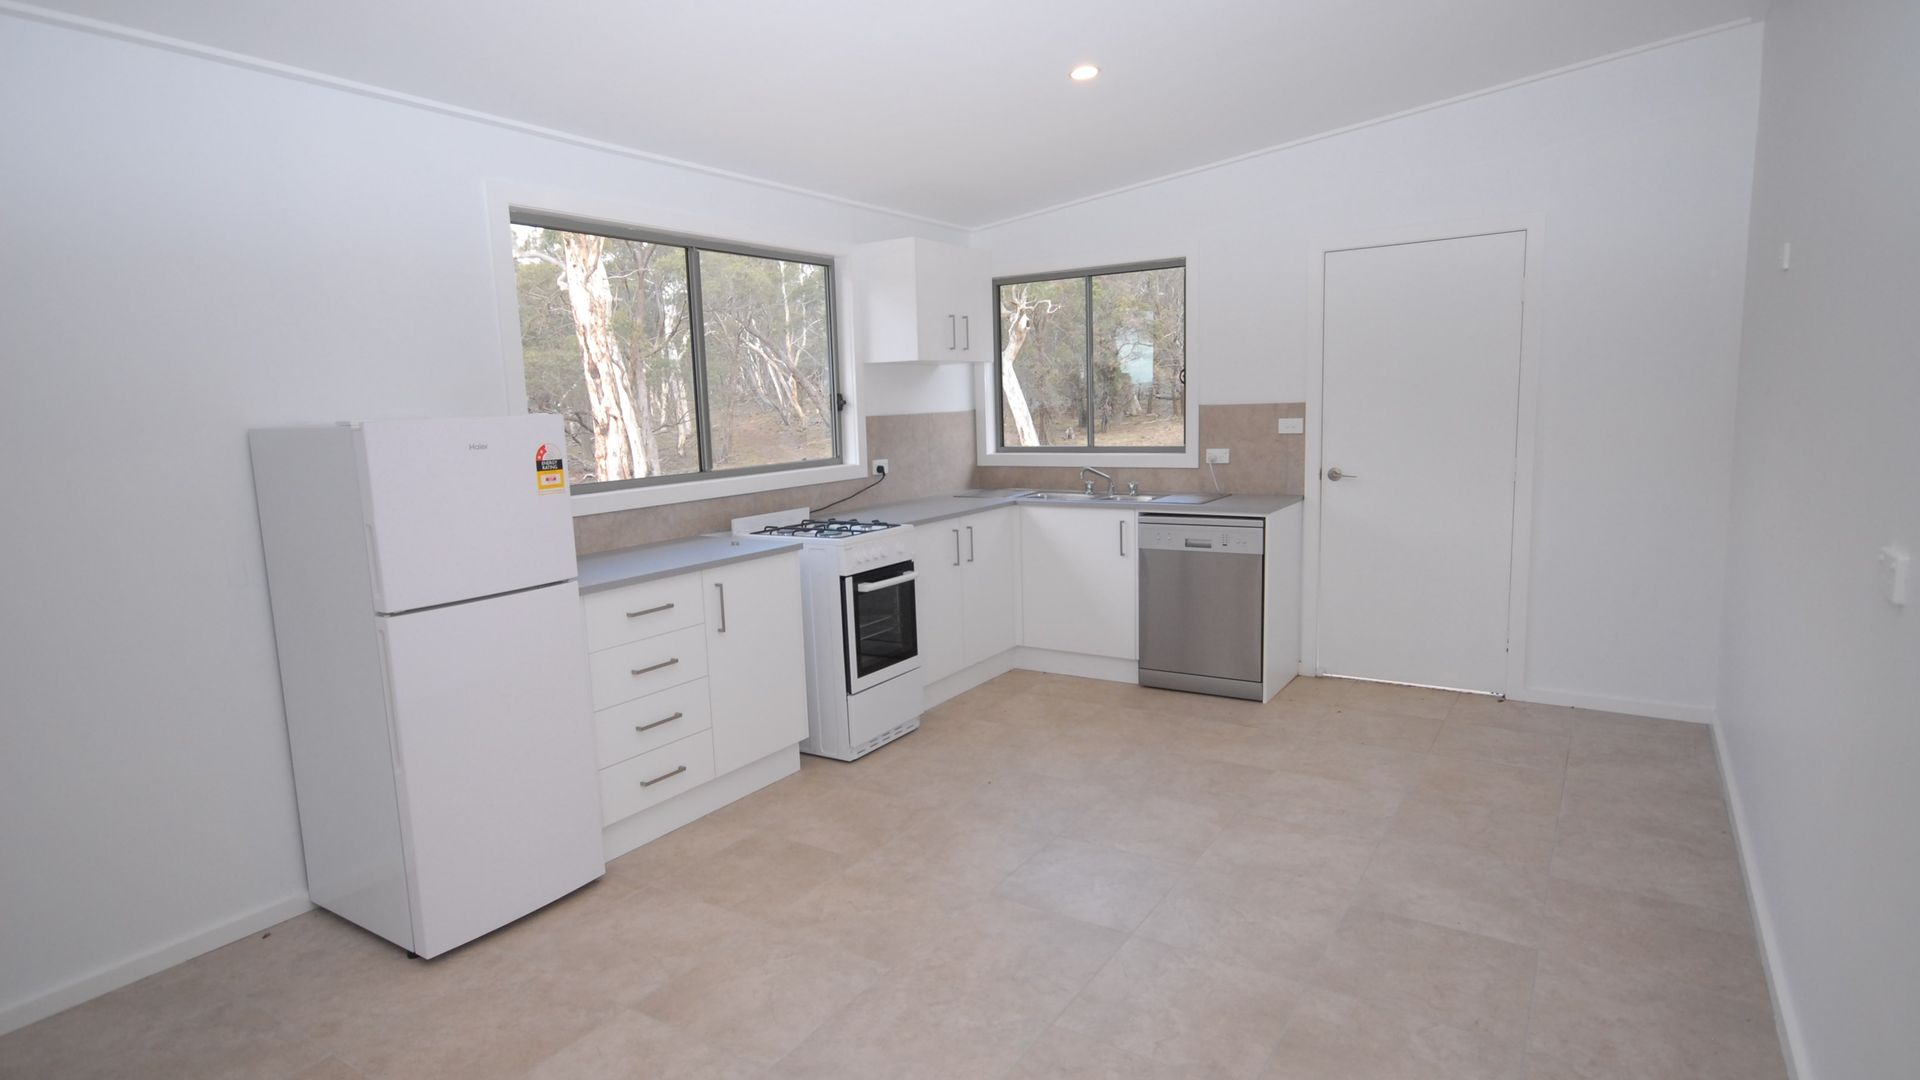 0000 Kings Highway, Bungendore NSW 2621, Image 1